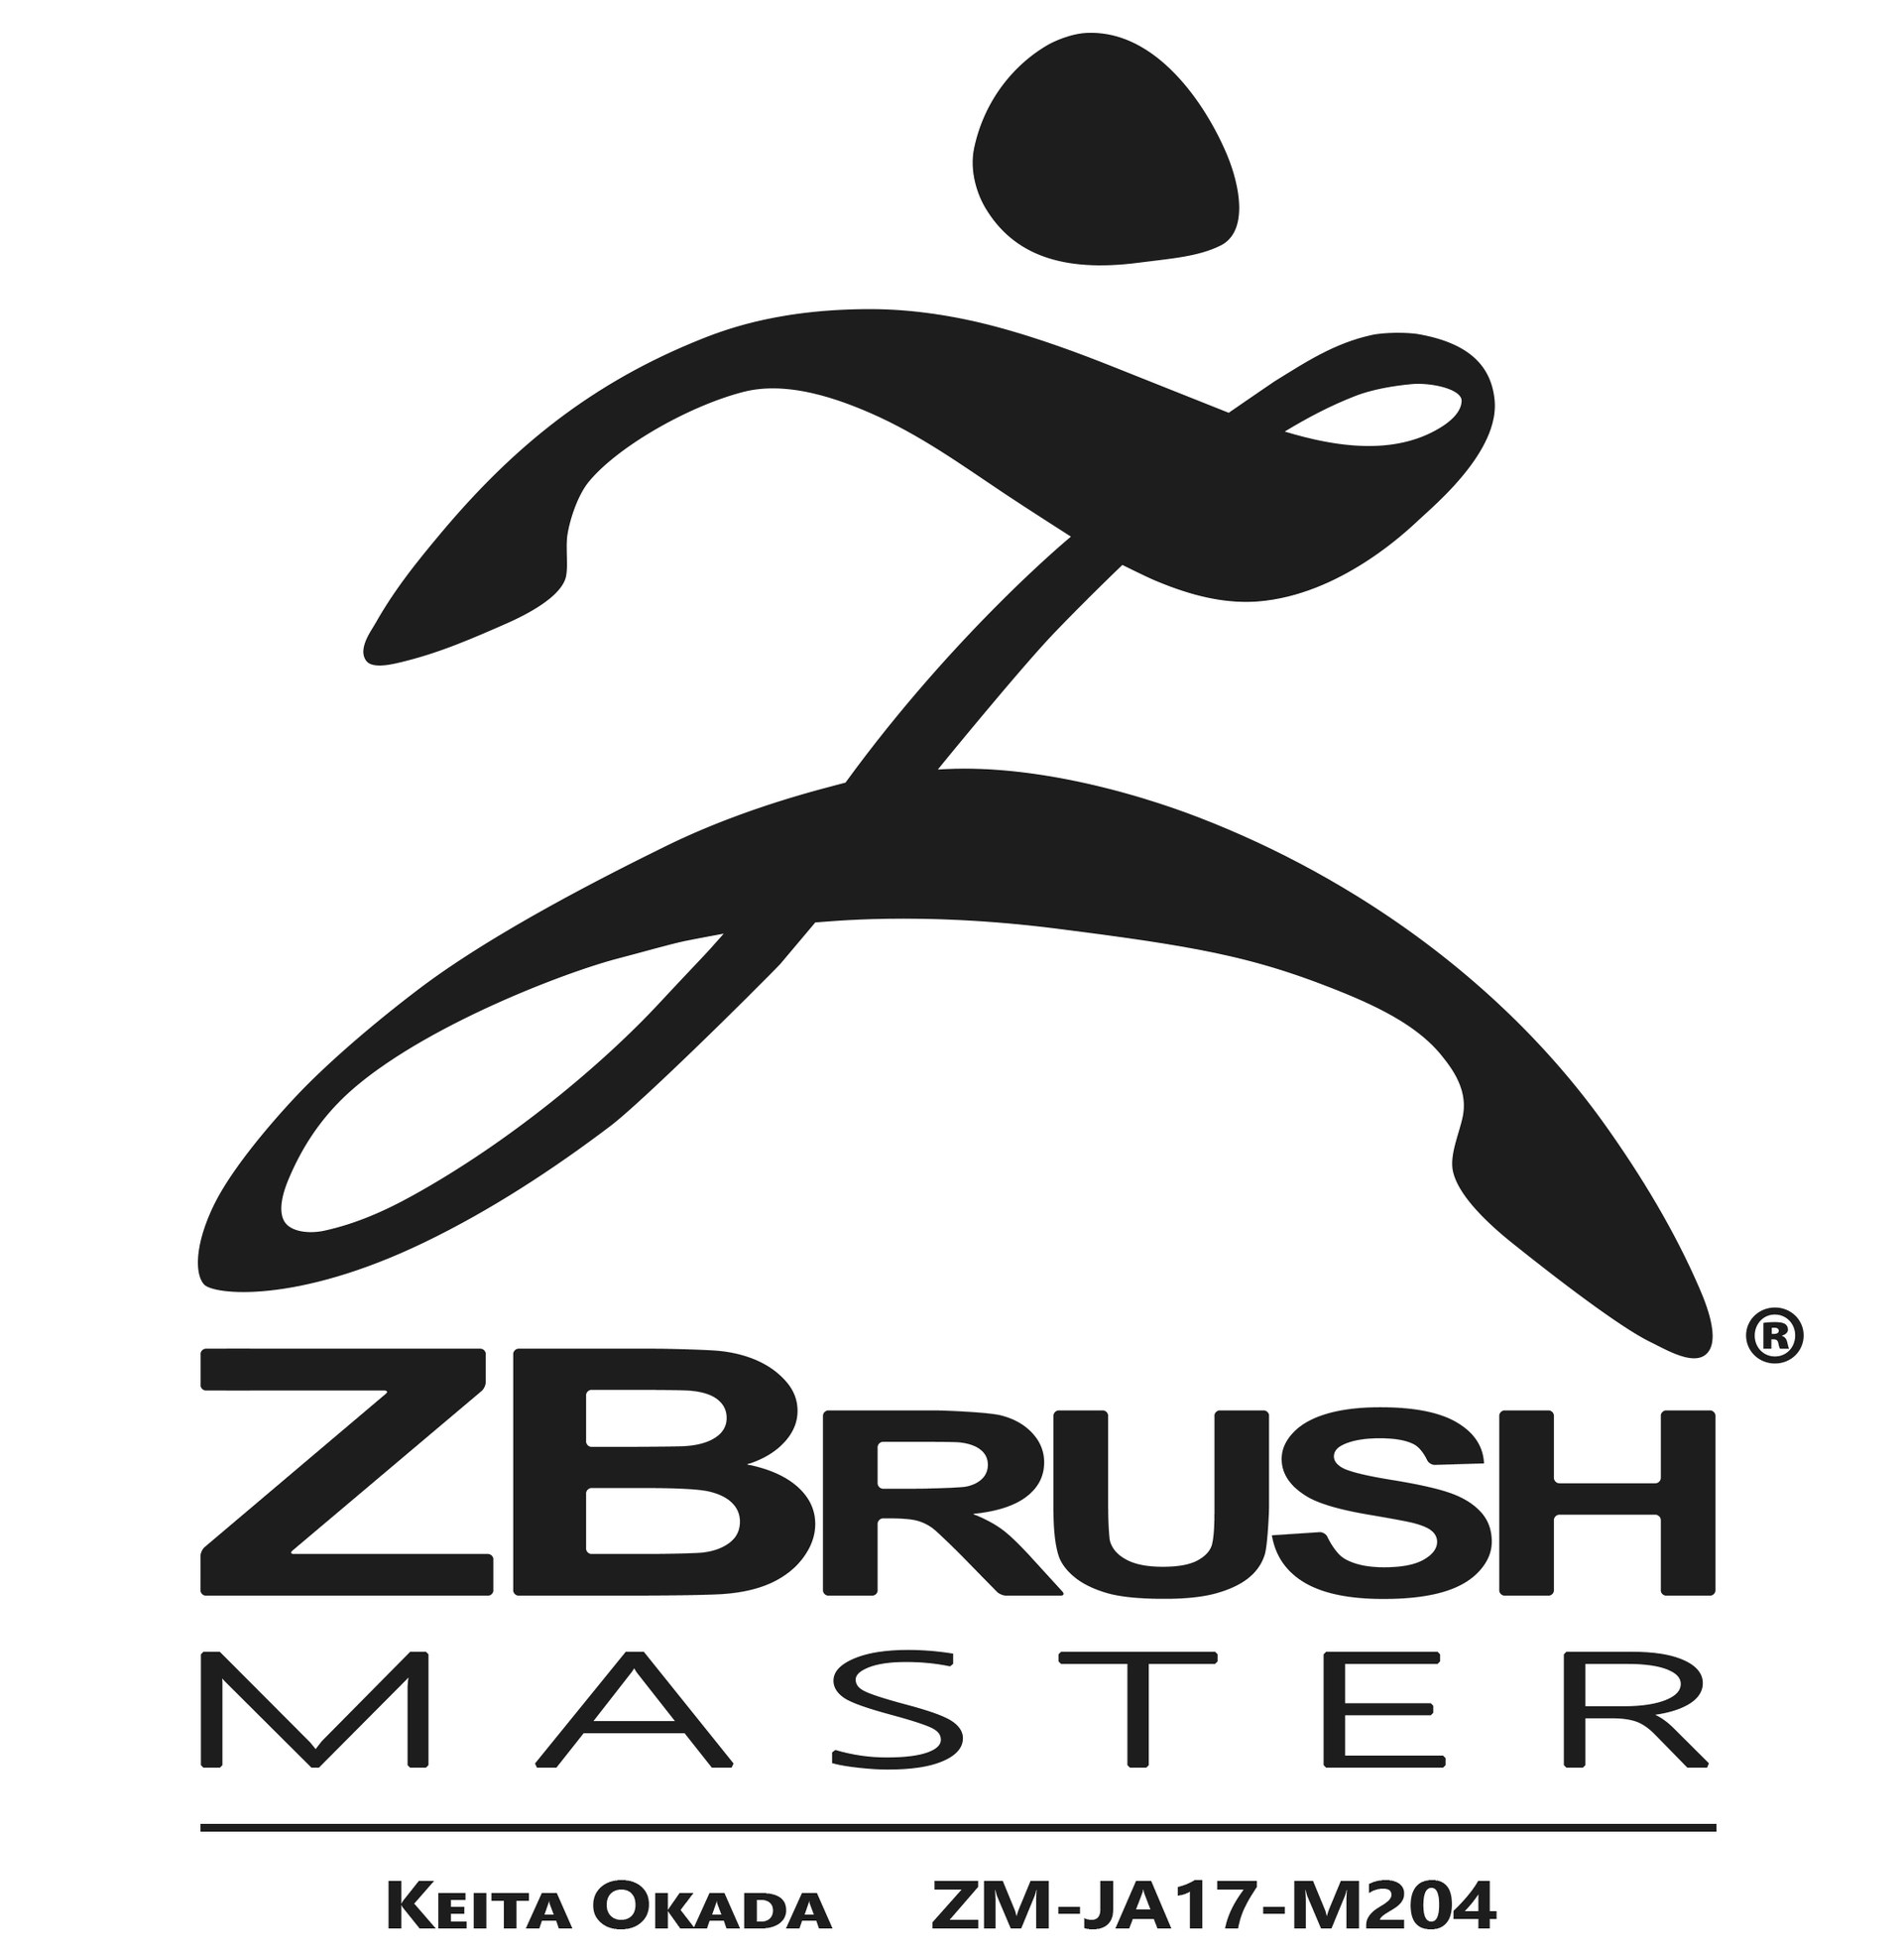 Keita okada zbrushmaster logo okada